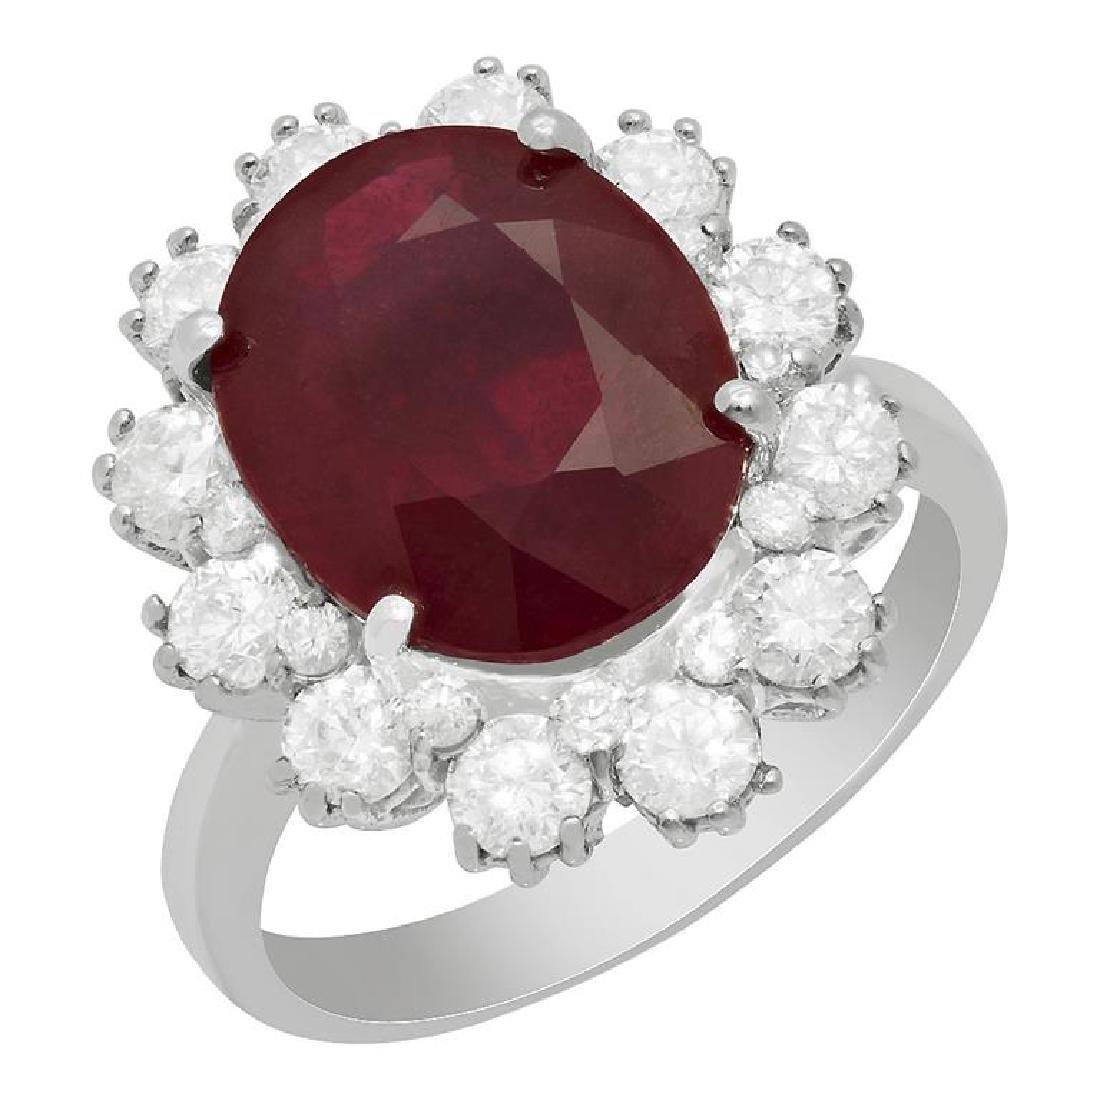 14k White Gold 6.15ct Ruby 1.44ct Diamond Ring